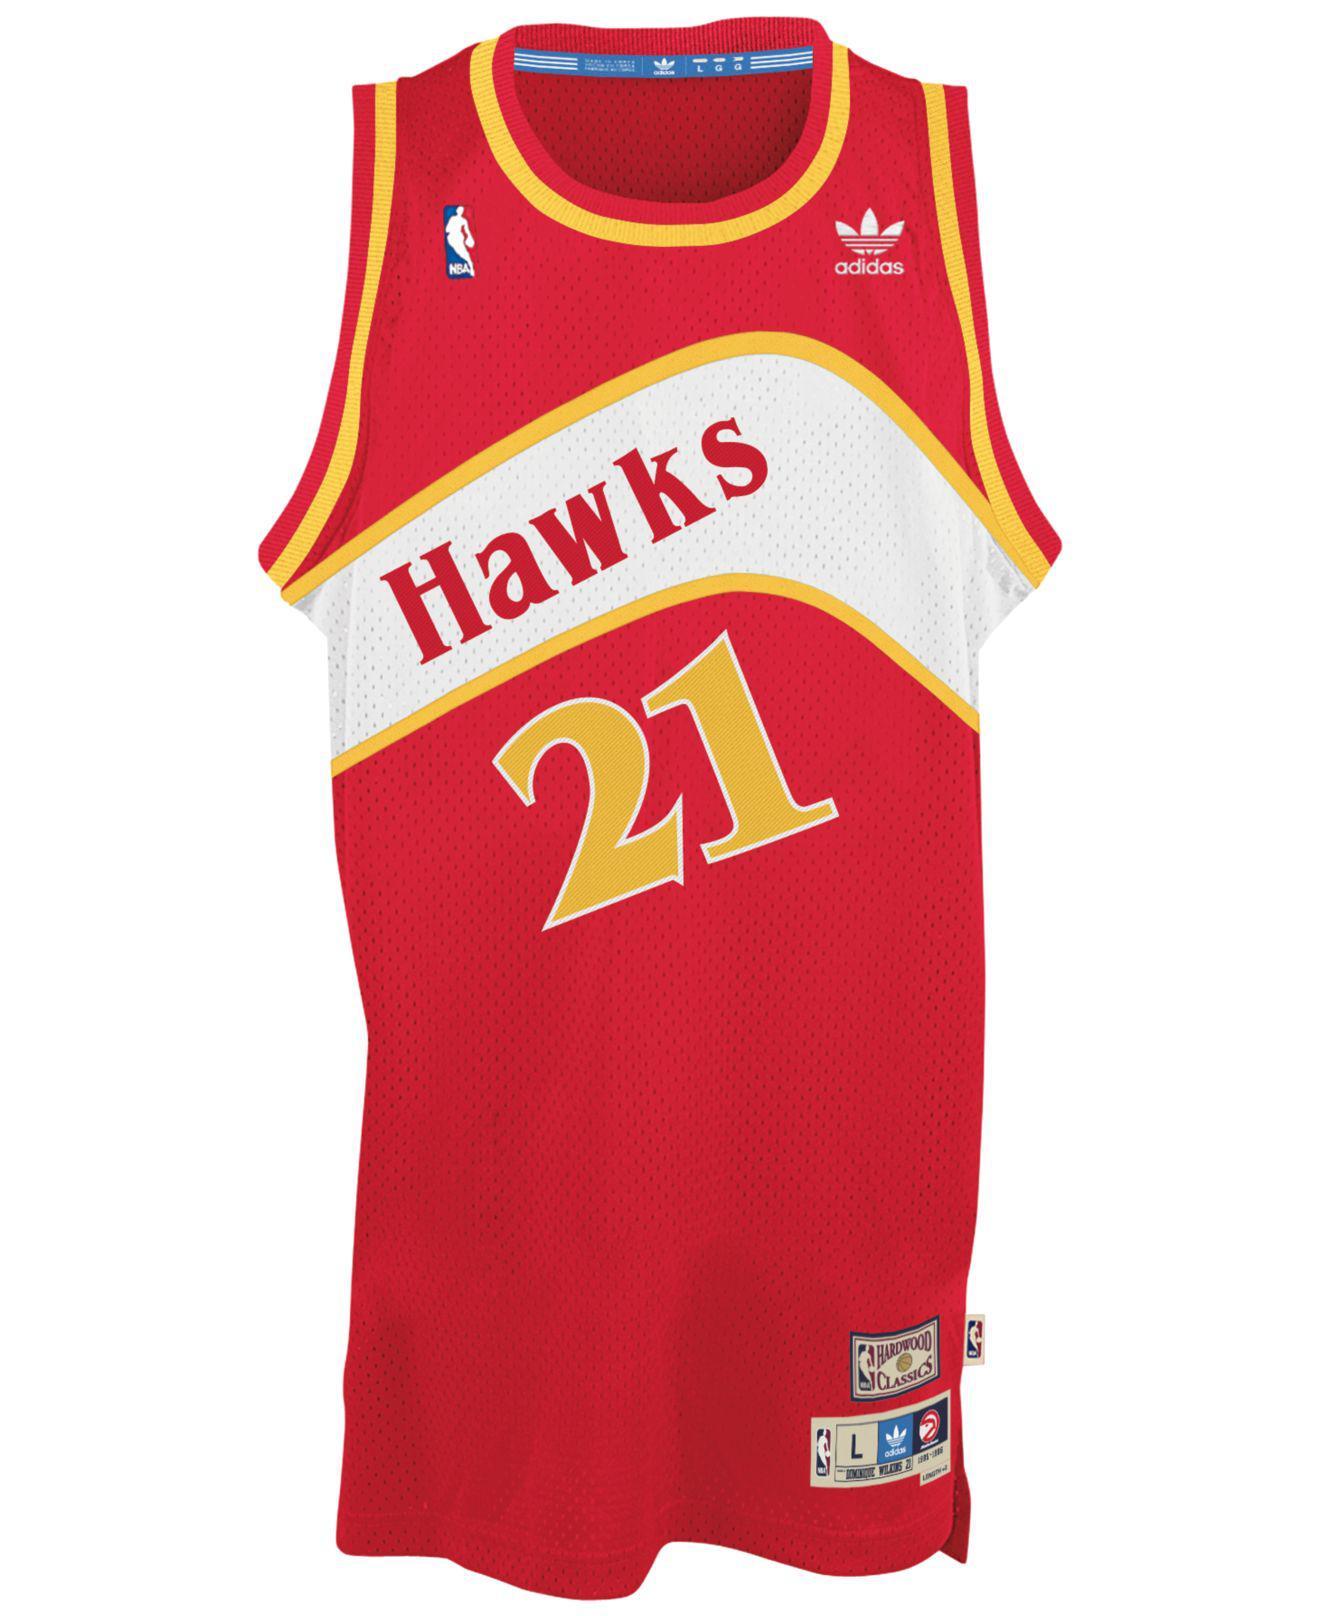 0a7acb42b41 adidas Men'S Dominique Wilkins Atlanta Hawks Swingman Jersey in Red for Men  - Save 27% - Lyst